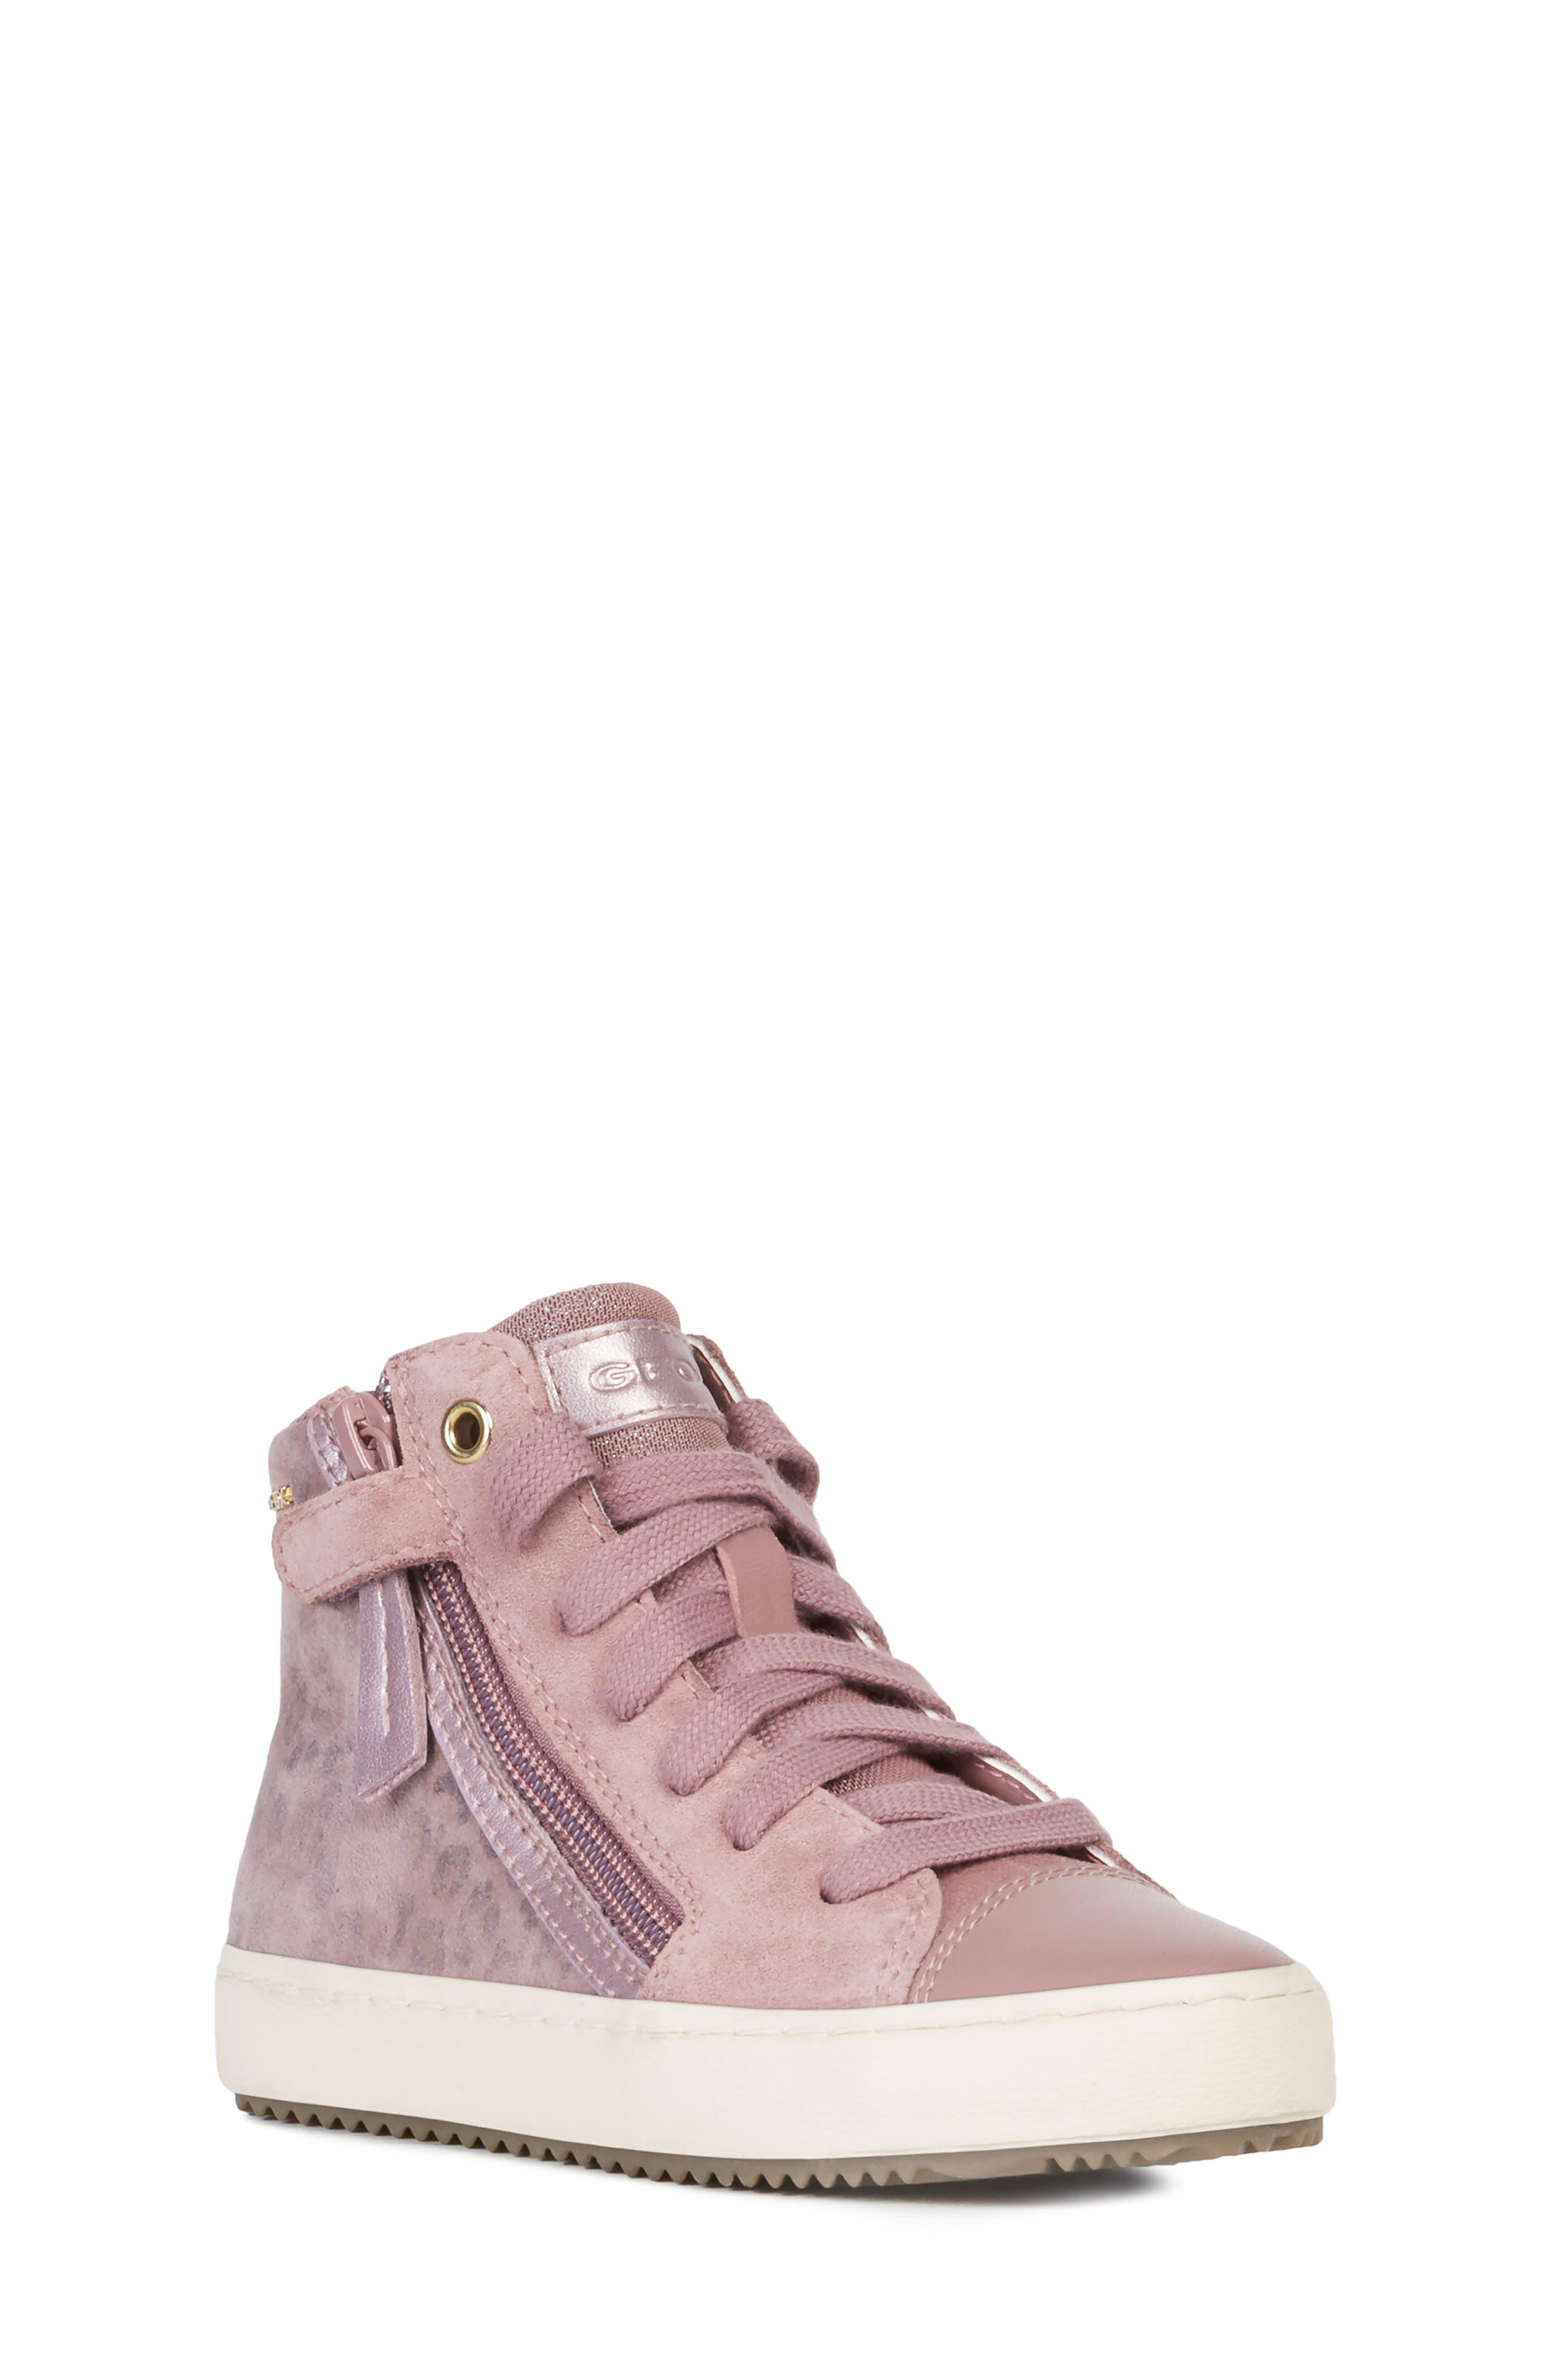 Girls Geox Kalispera HighTop Sneaker Size 55US  38EU  Pink